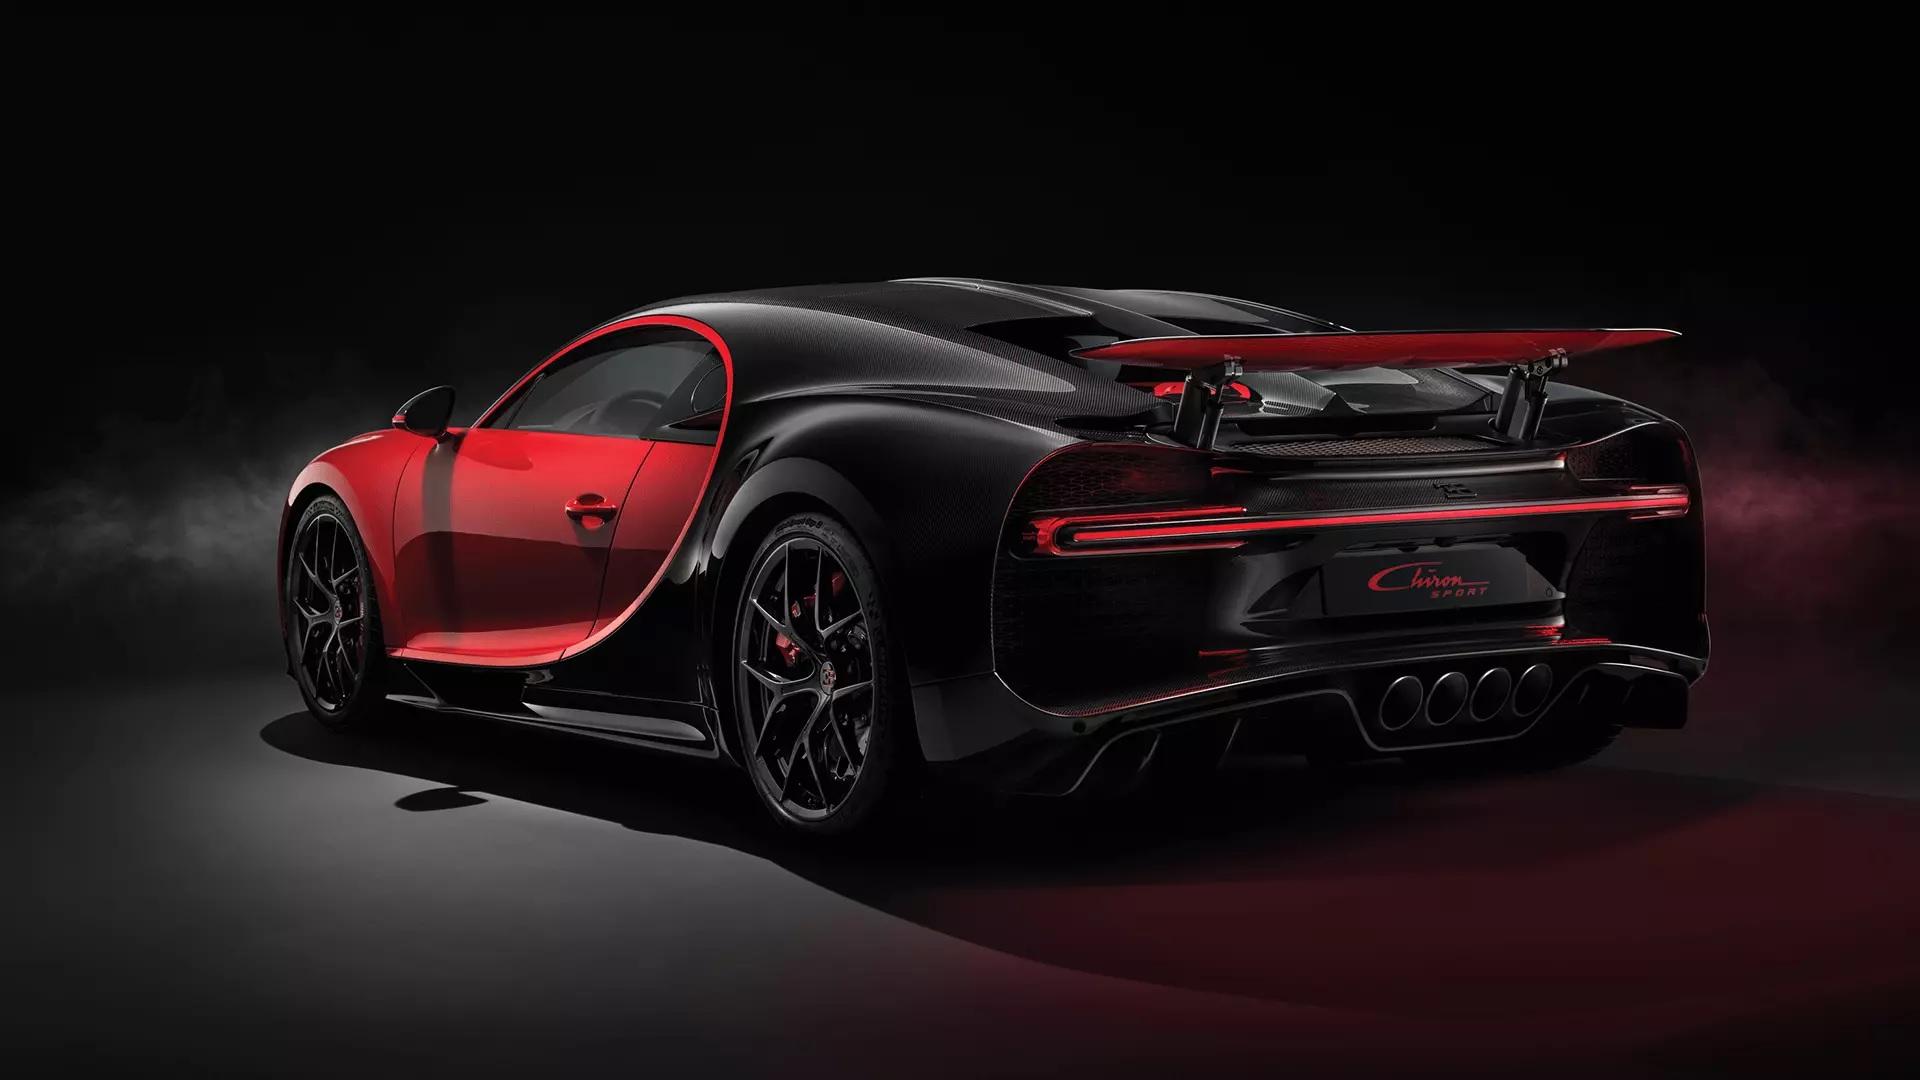 Bugatti Chiron Sport Debuts At Geneva Motor Show Better Handling